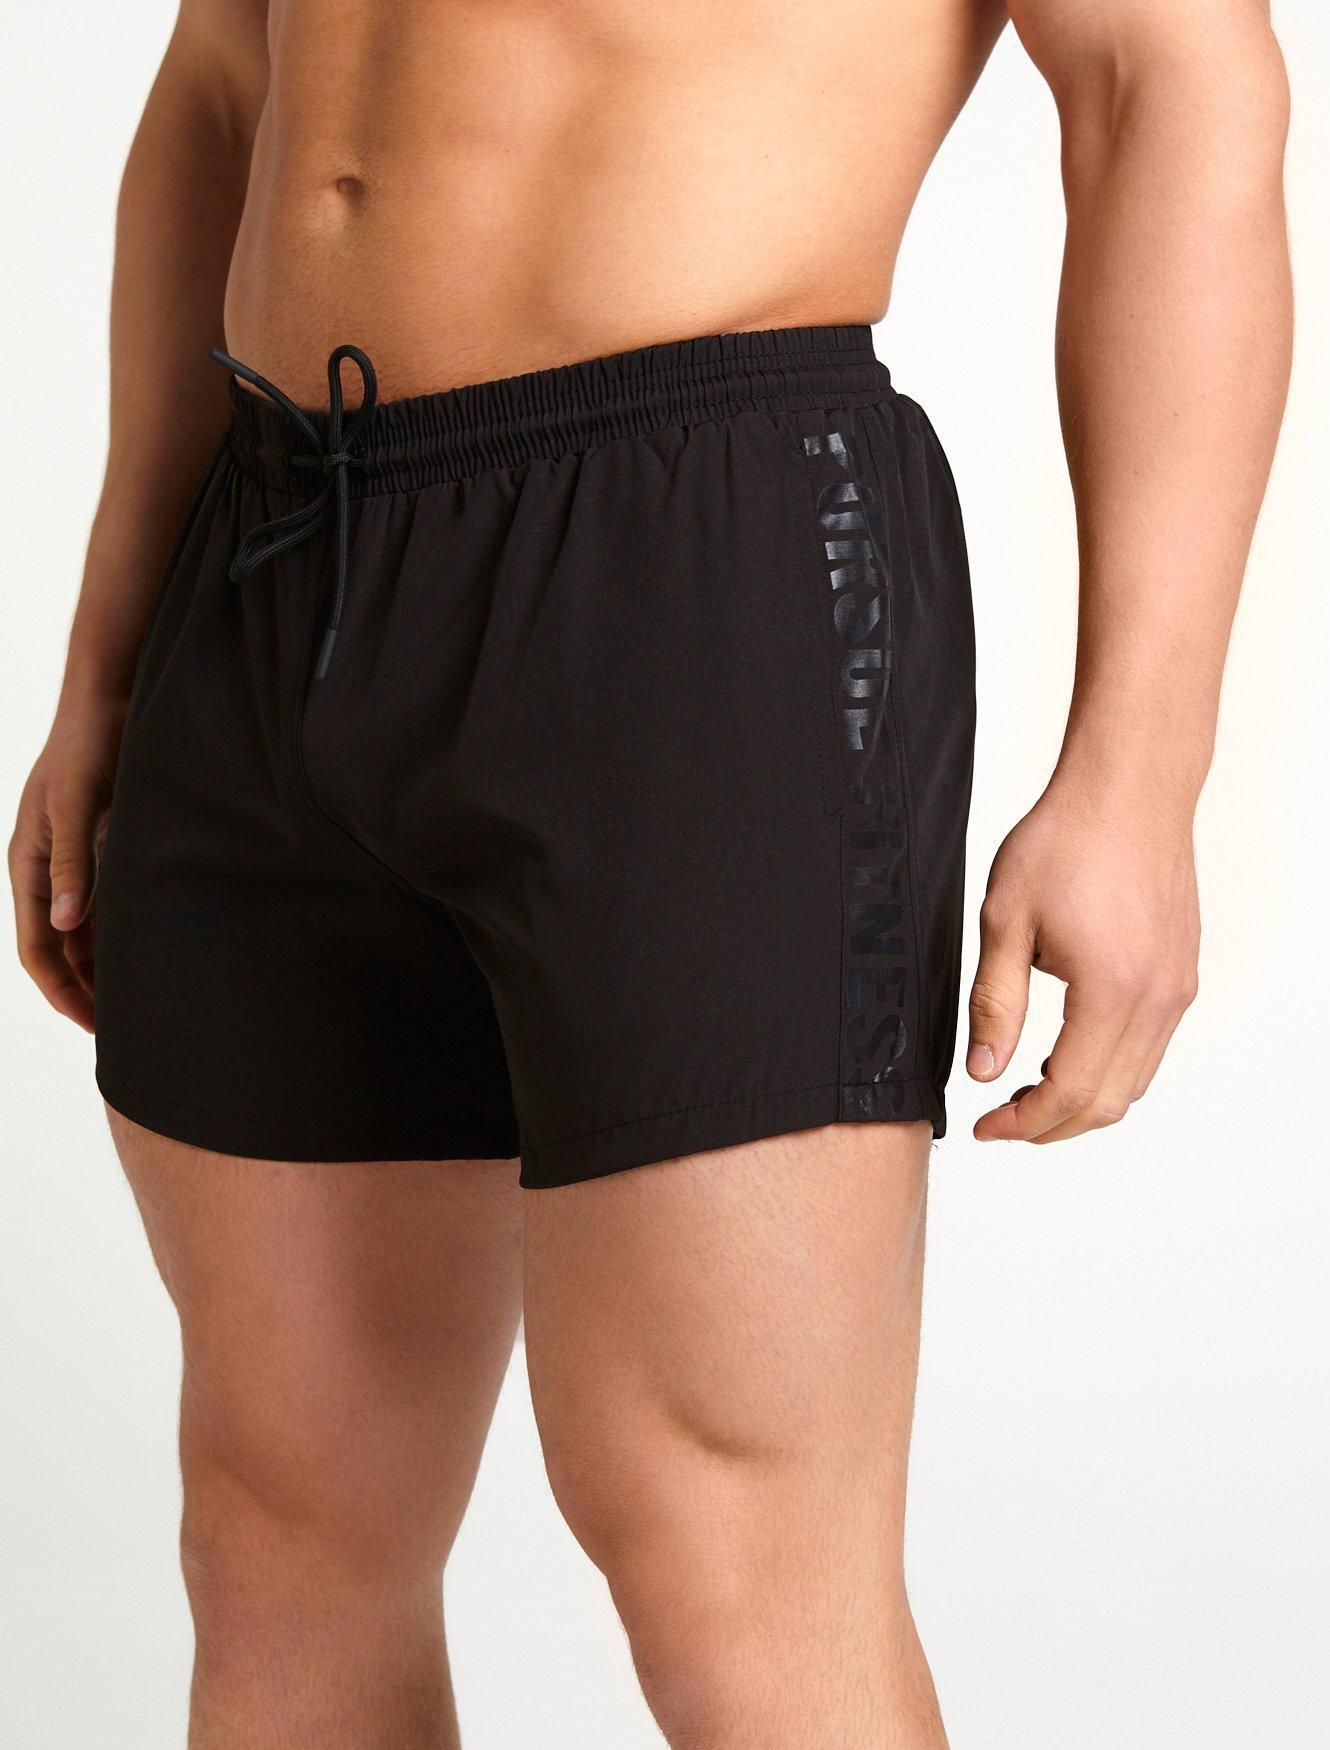 Men's Gym Shorts & Swim Shorts | GYMVERSUS